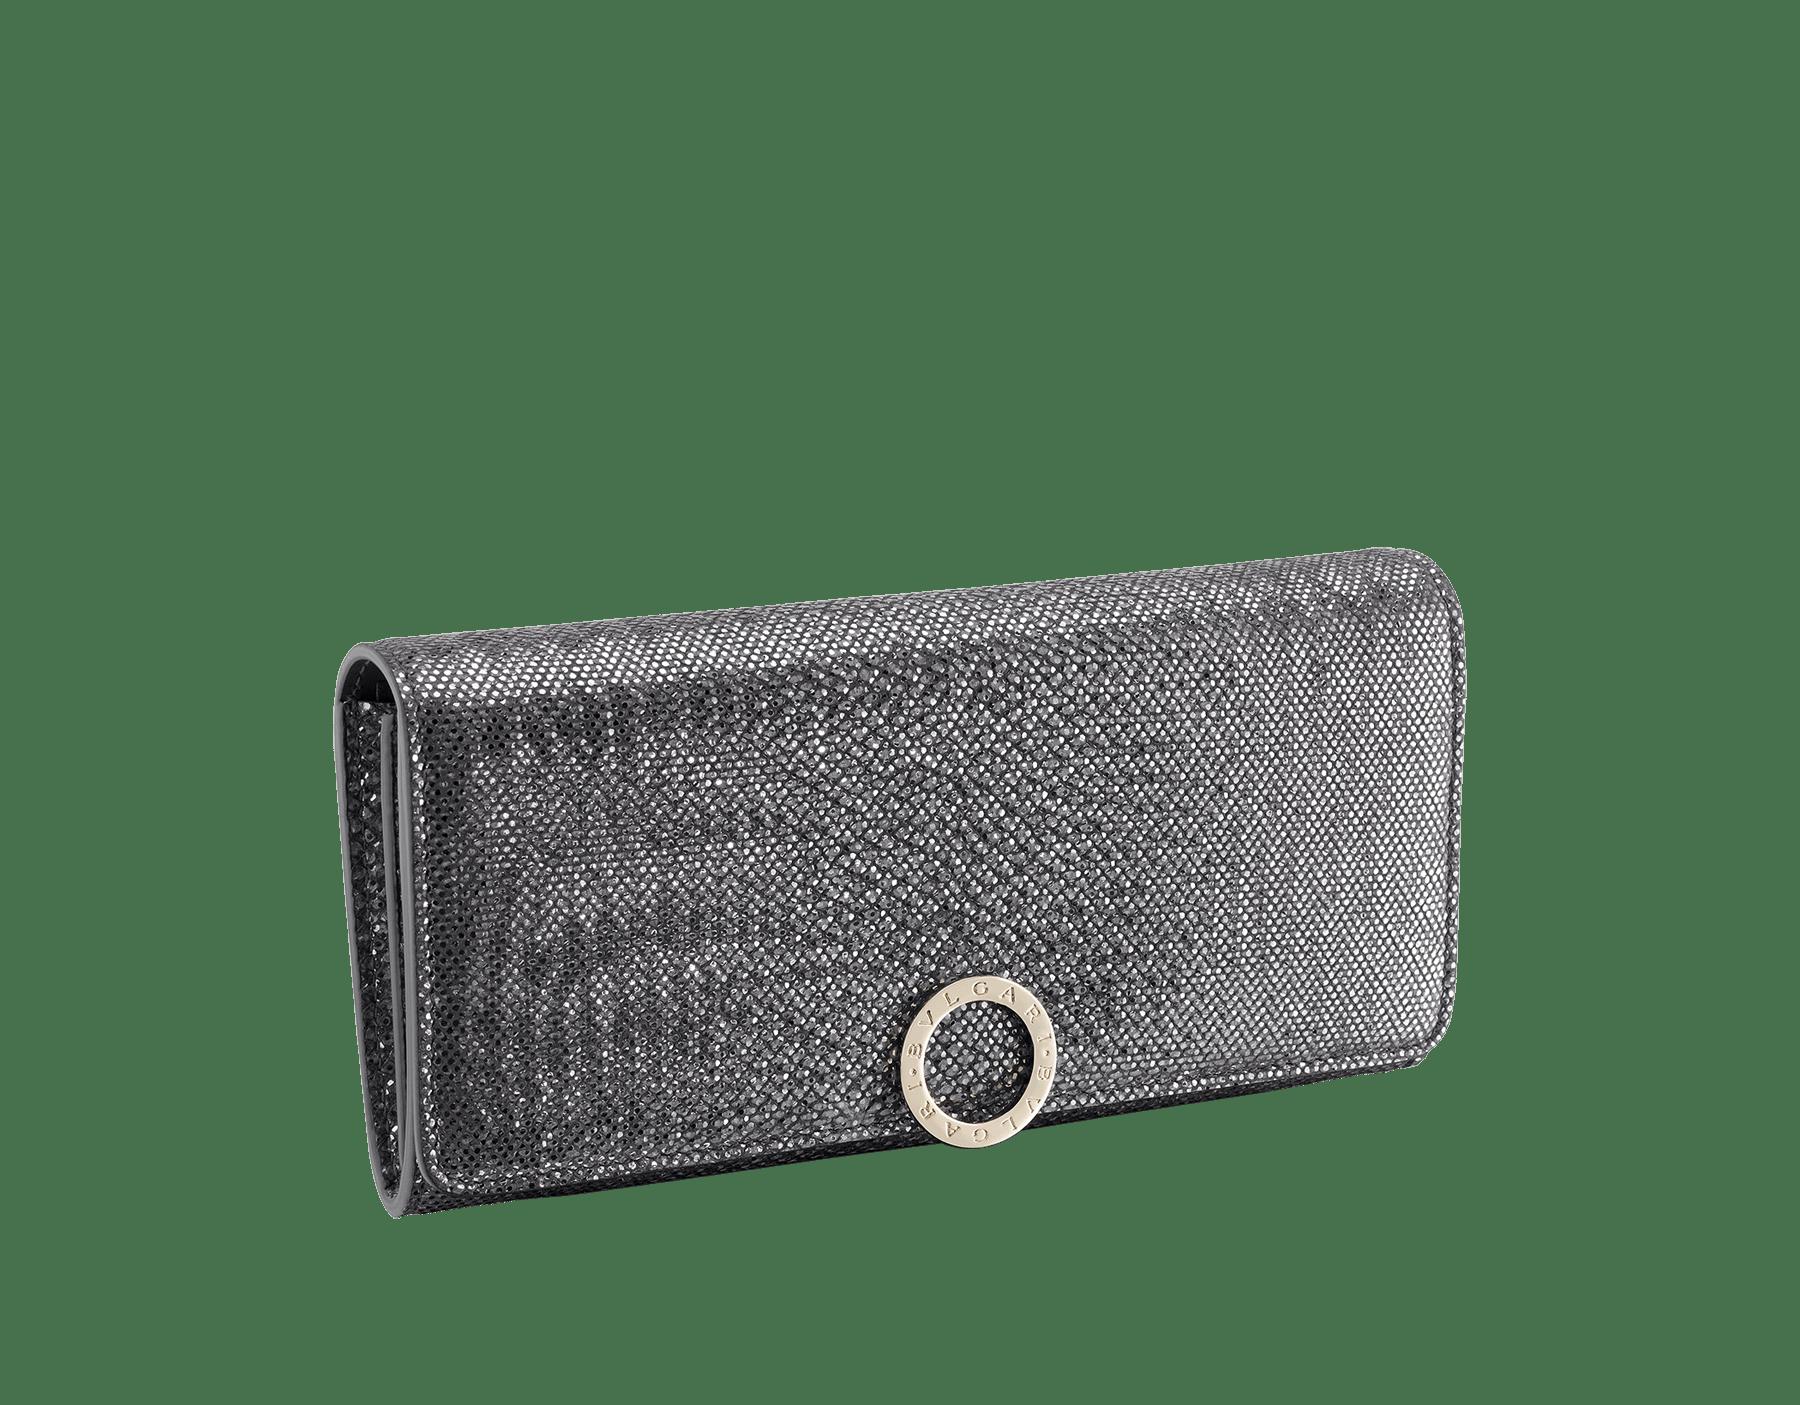 Wallet pochette in emerald green shiny karung skin and amethyst purple nappa. Brass light gold plated hardware and iconic BVLGARI BVLGARI closure clip. 579-WLT-SLI-POC-CL-MK image 1